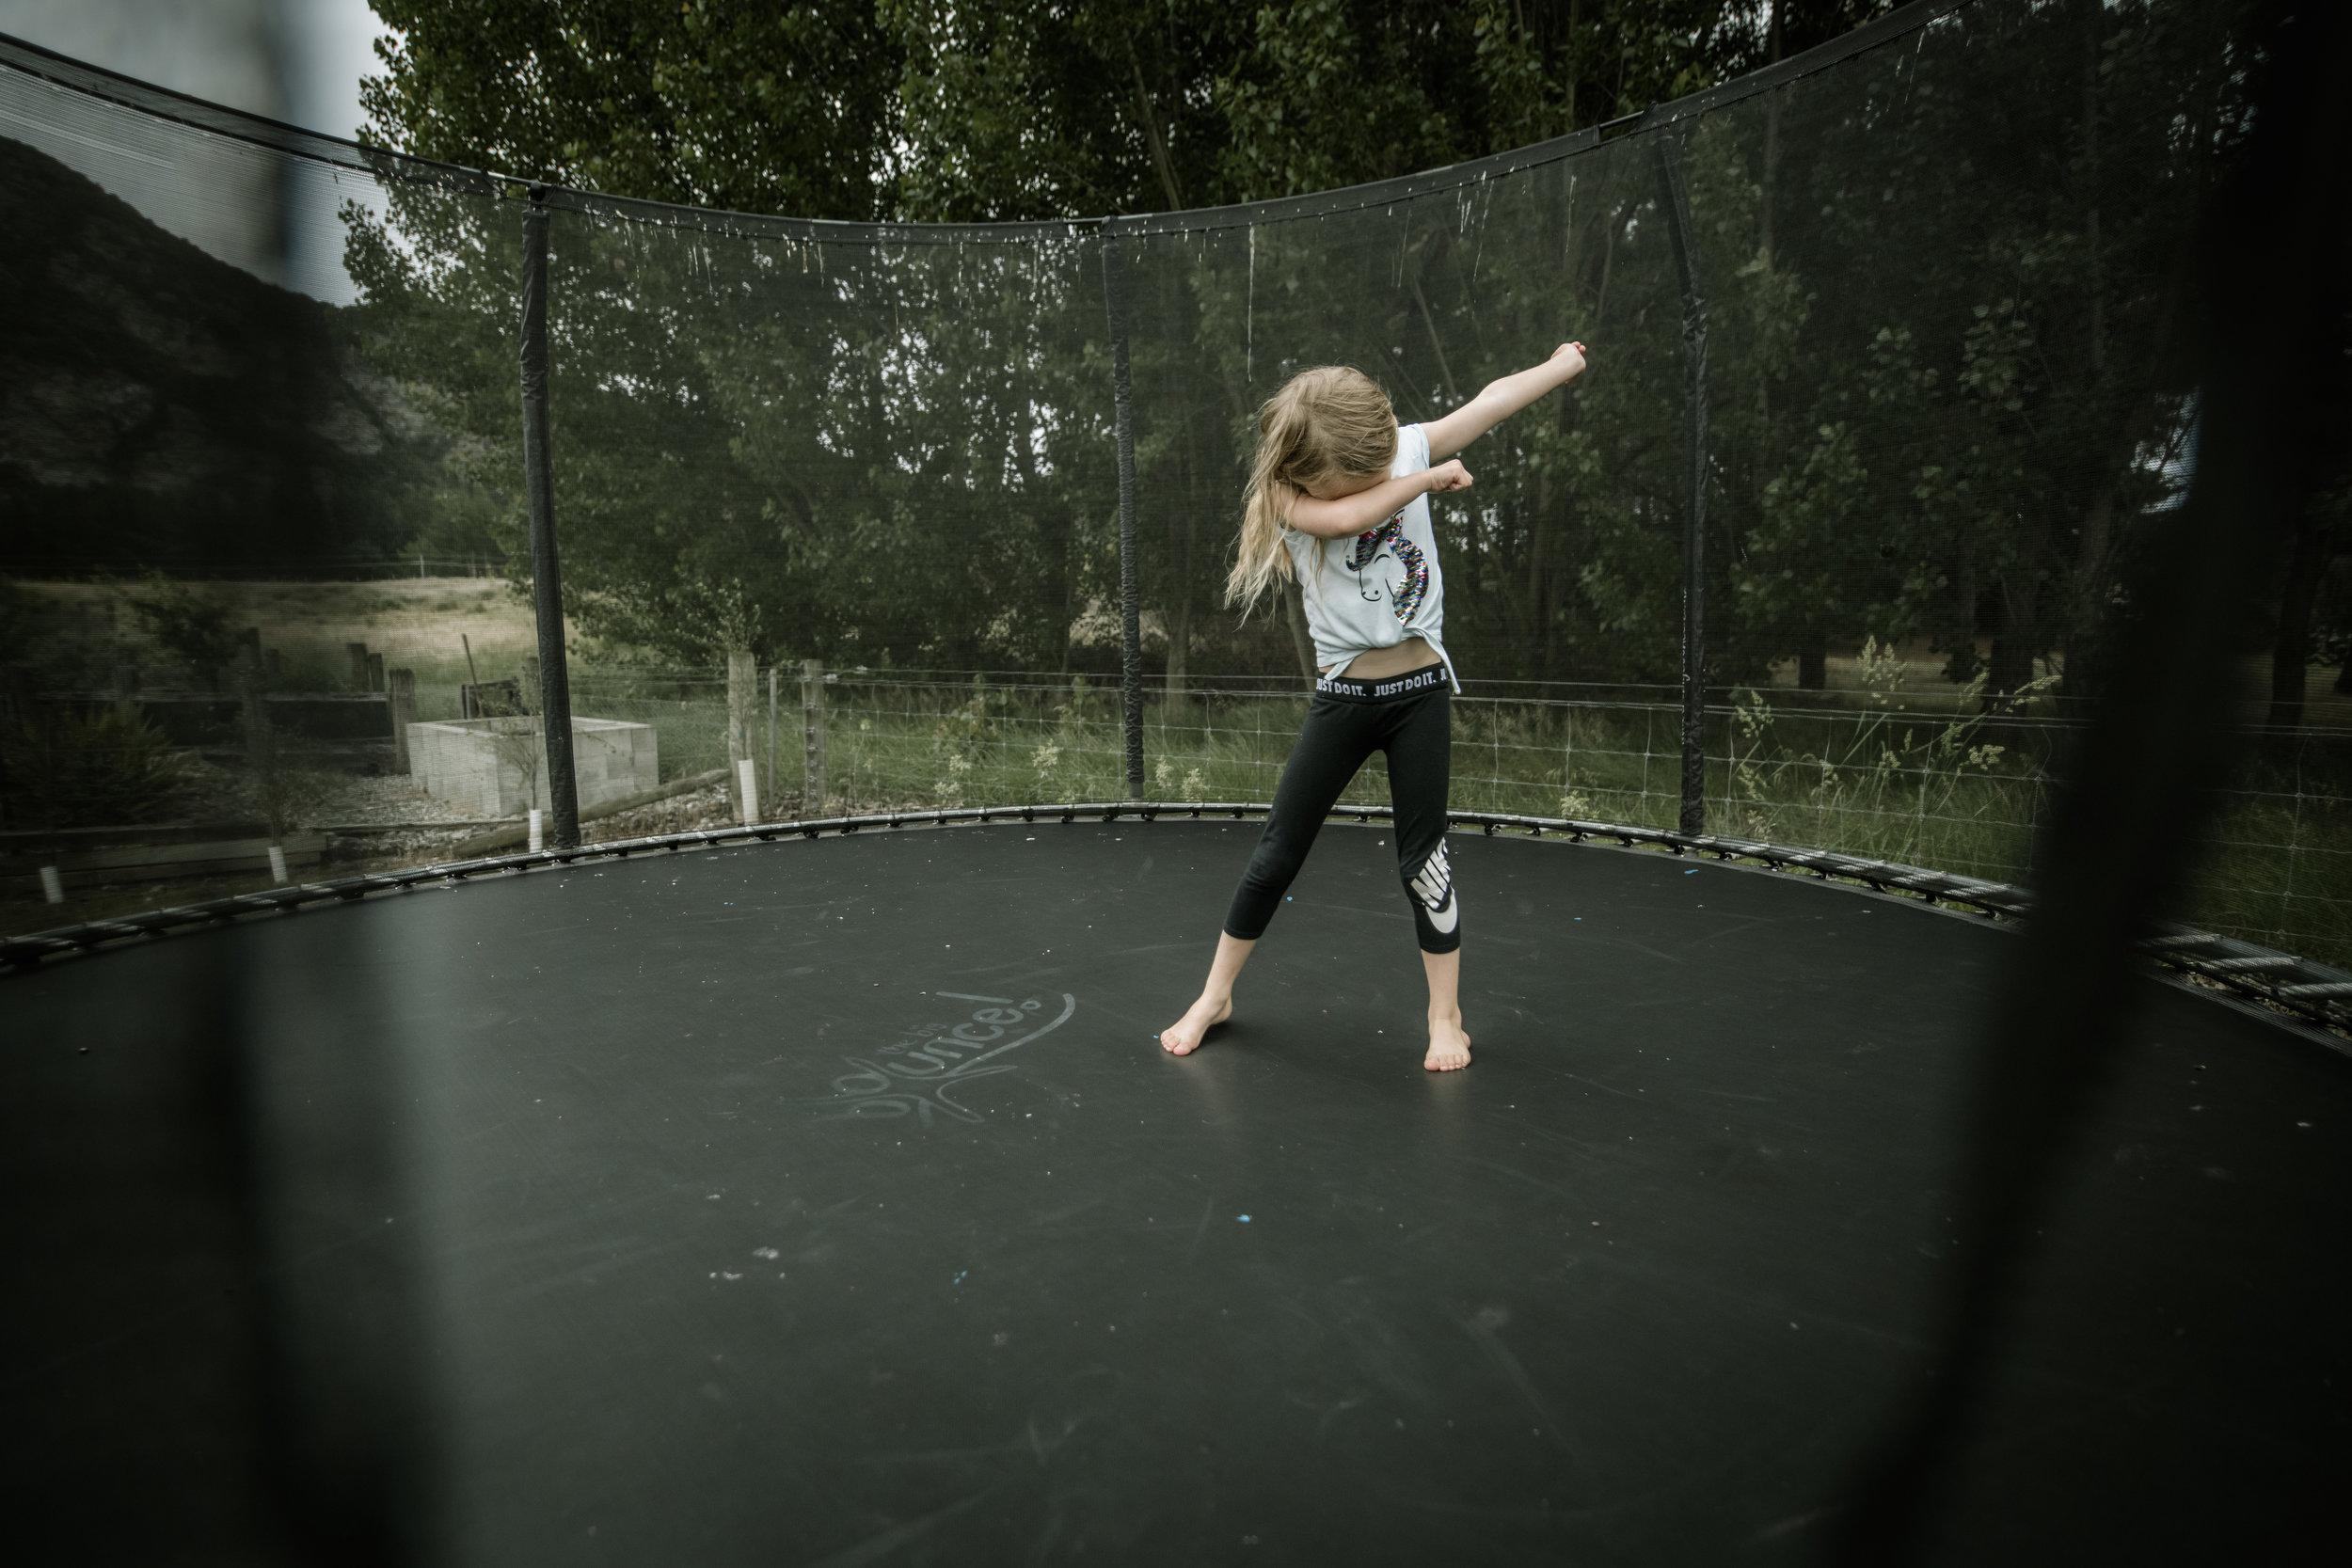 Harper - Trampoline dabbing